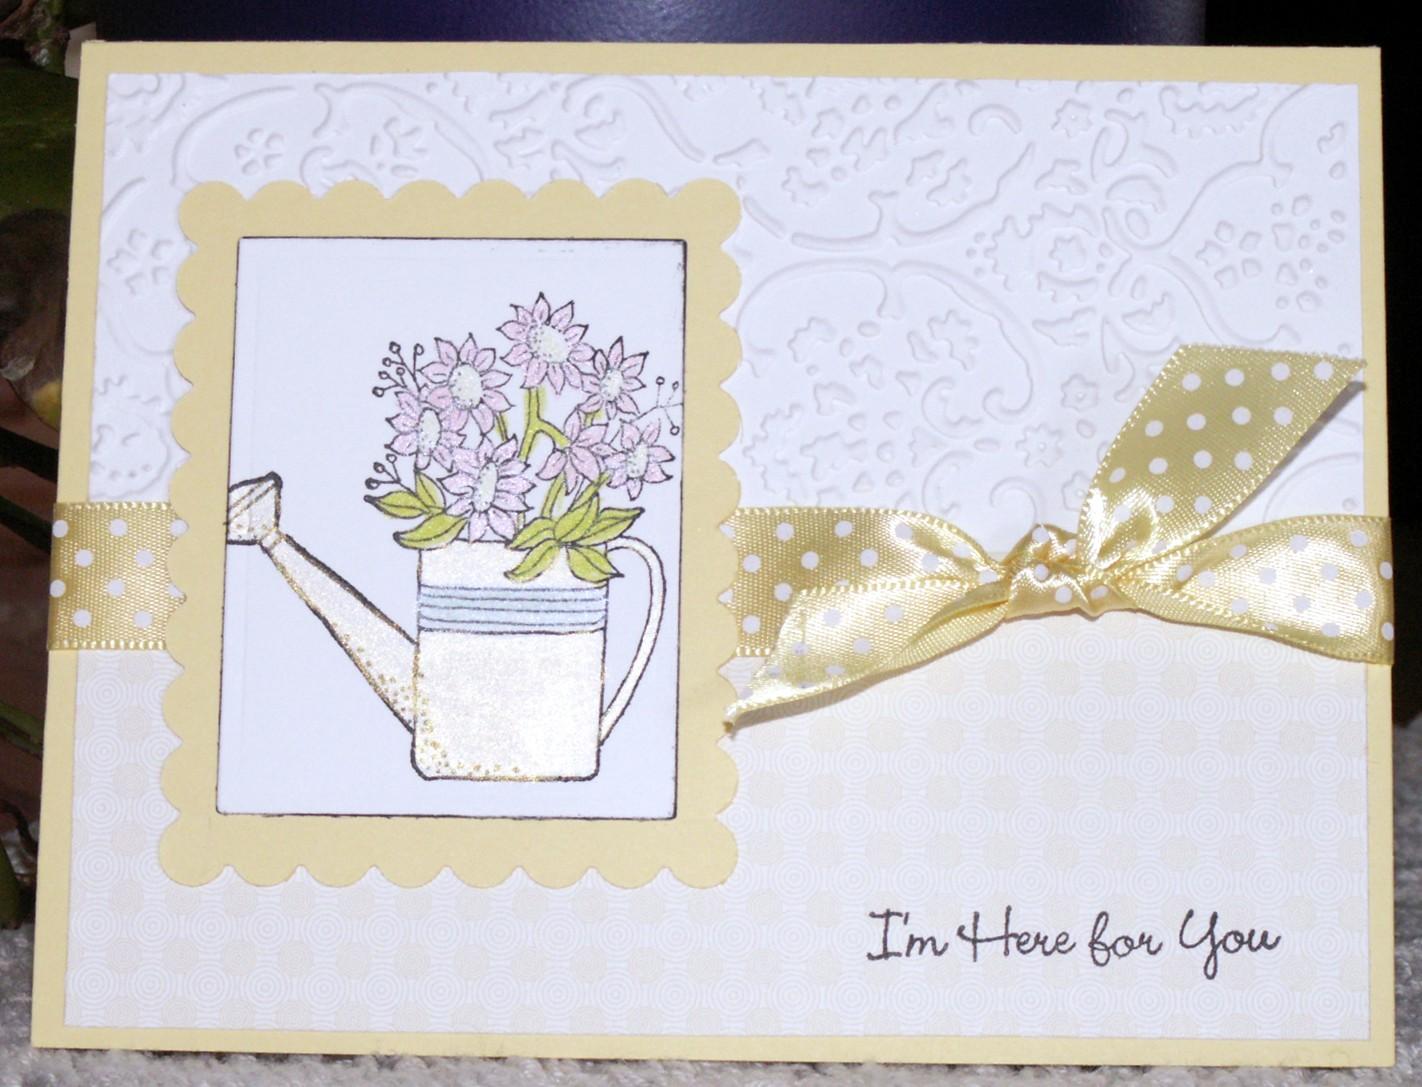 [gina+k.+flower+pot+h2o]